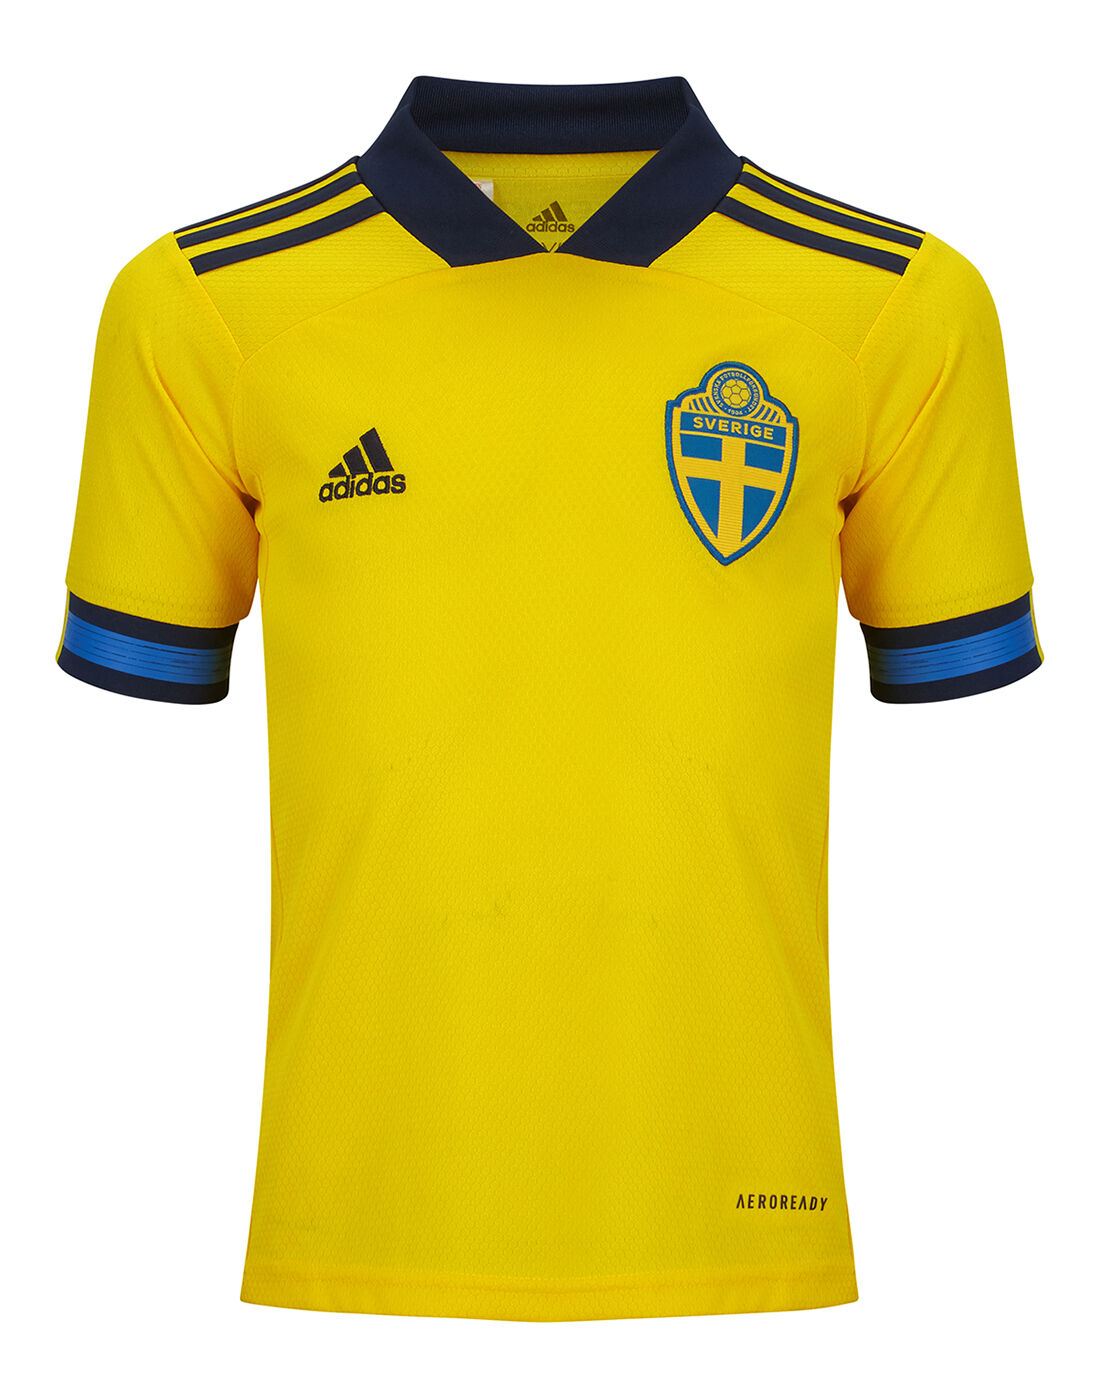 adidas Kids Sweden Euro 2020 Home Jersey - Yellow | adidas ...